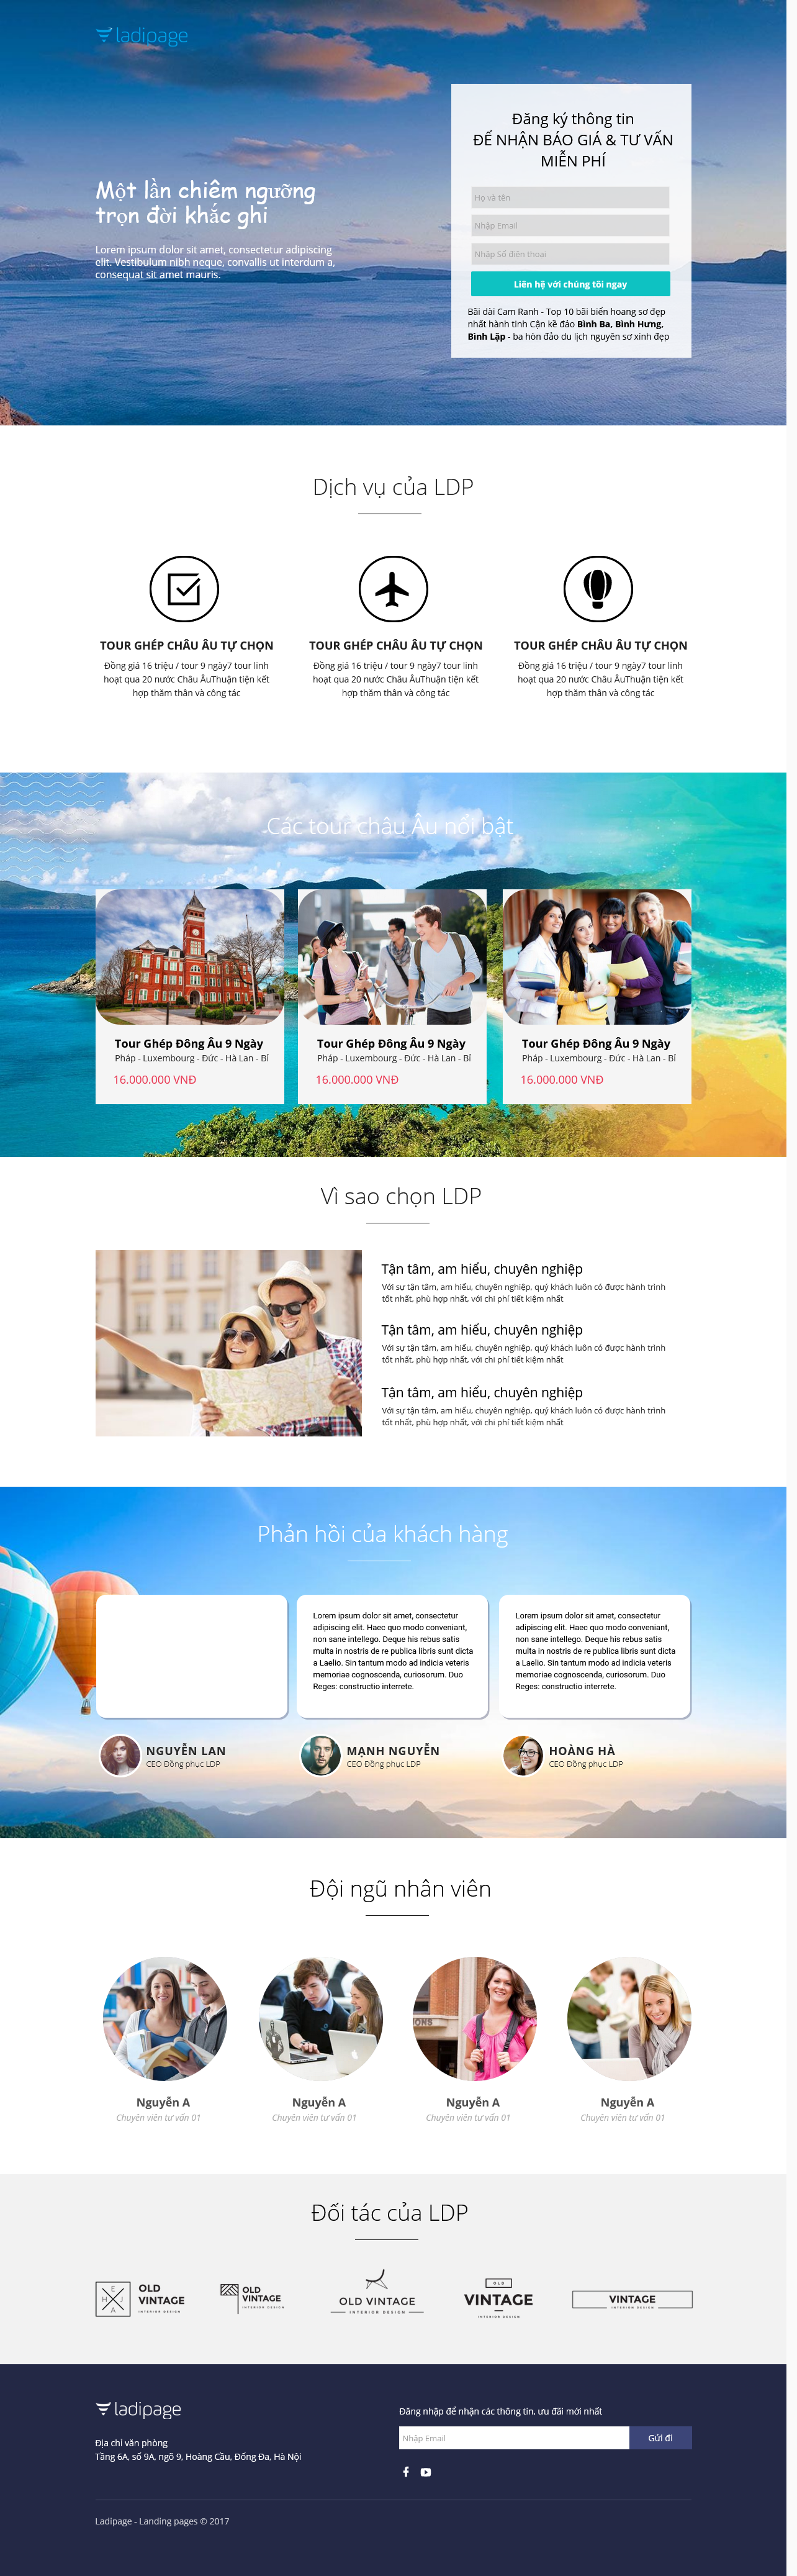 Thiết kế website Thiết kế webiste landingpage du-lich---khach-san---nghi-duong Du lịch 11